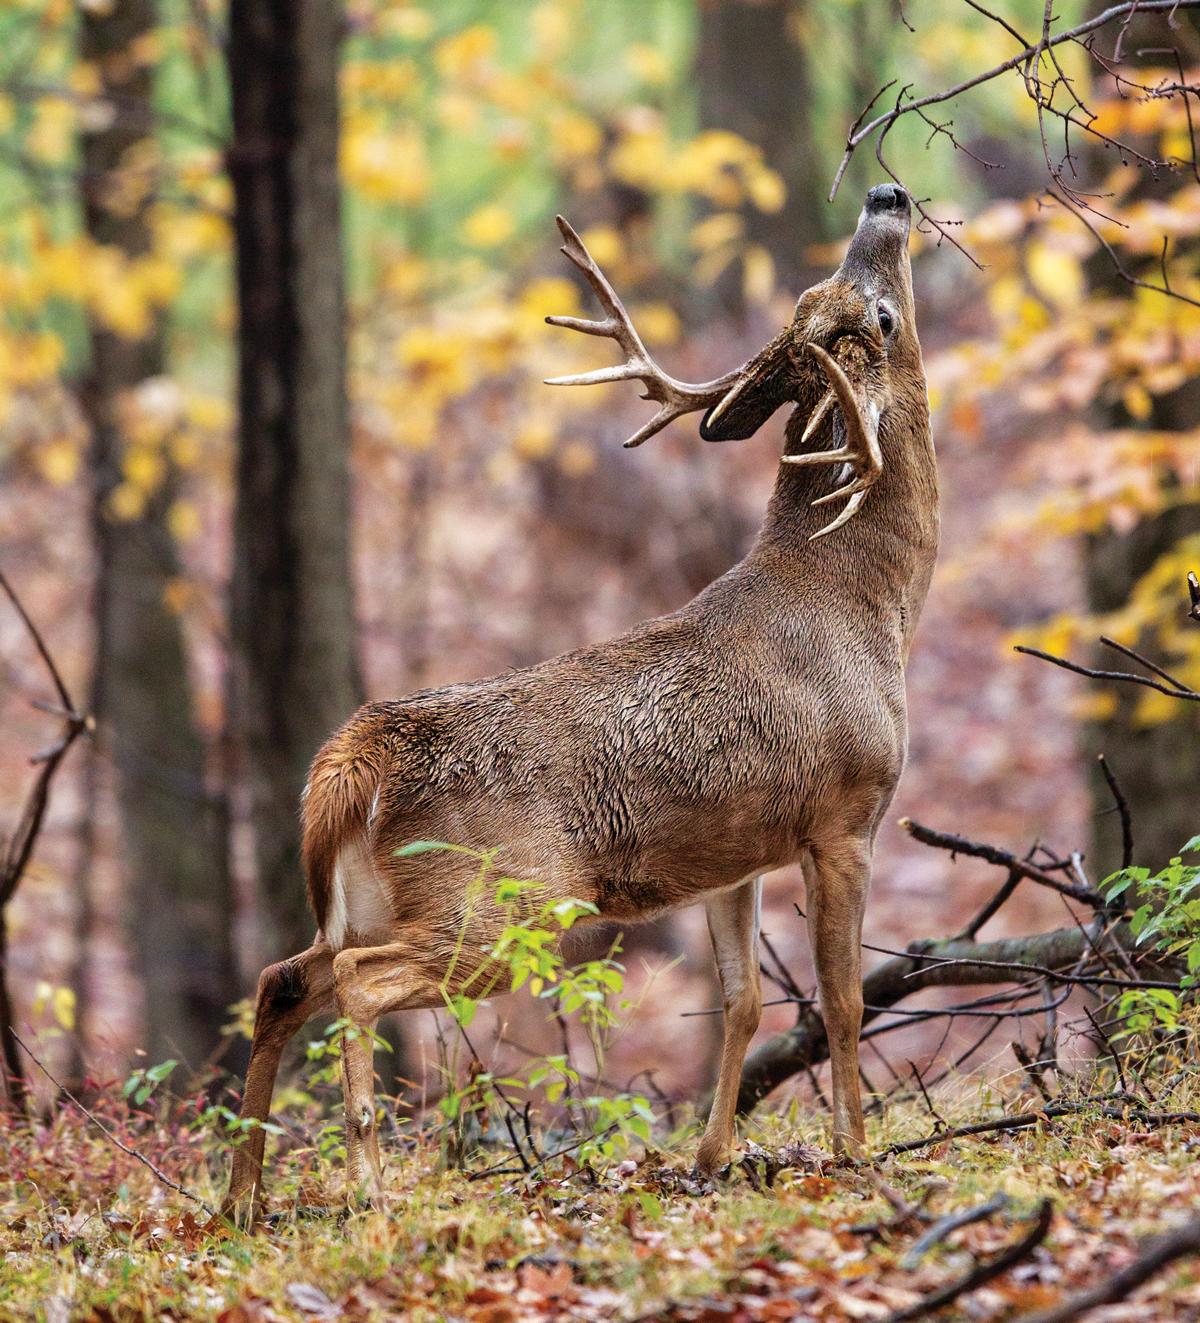 The Ultimate September Deer-Hunting Guide